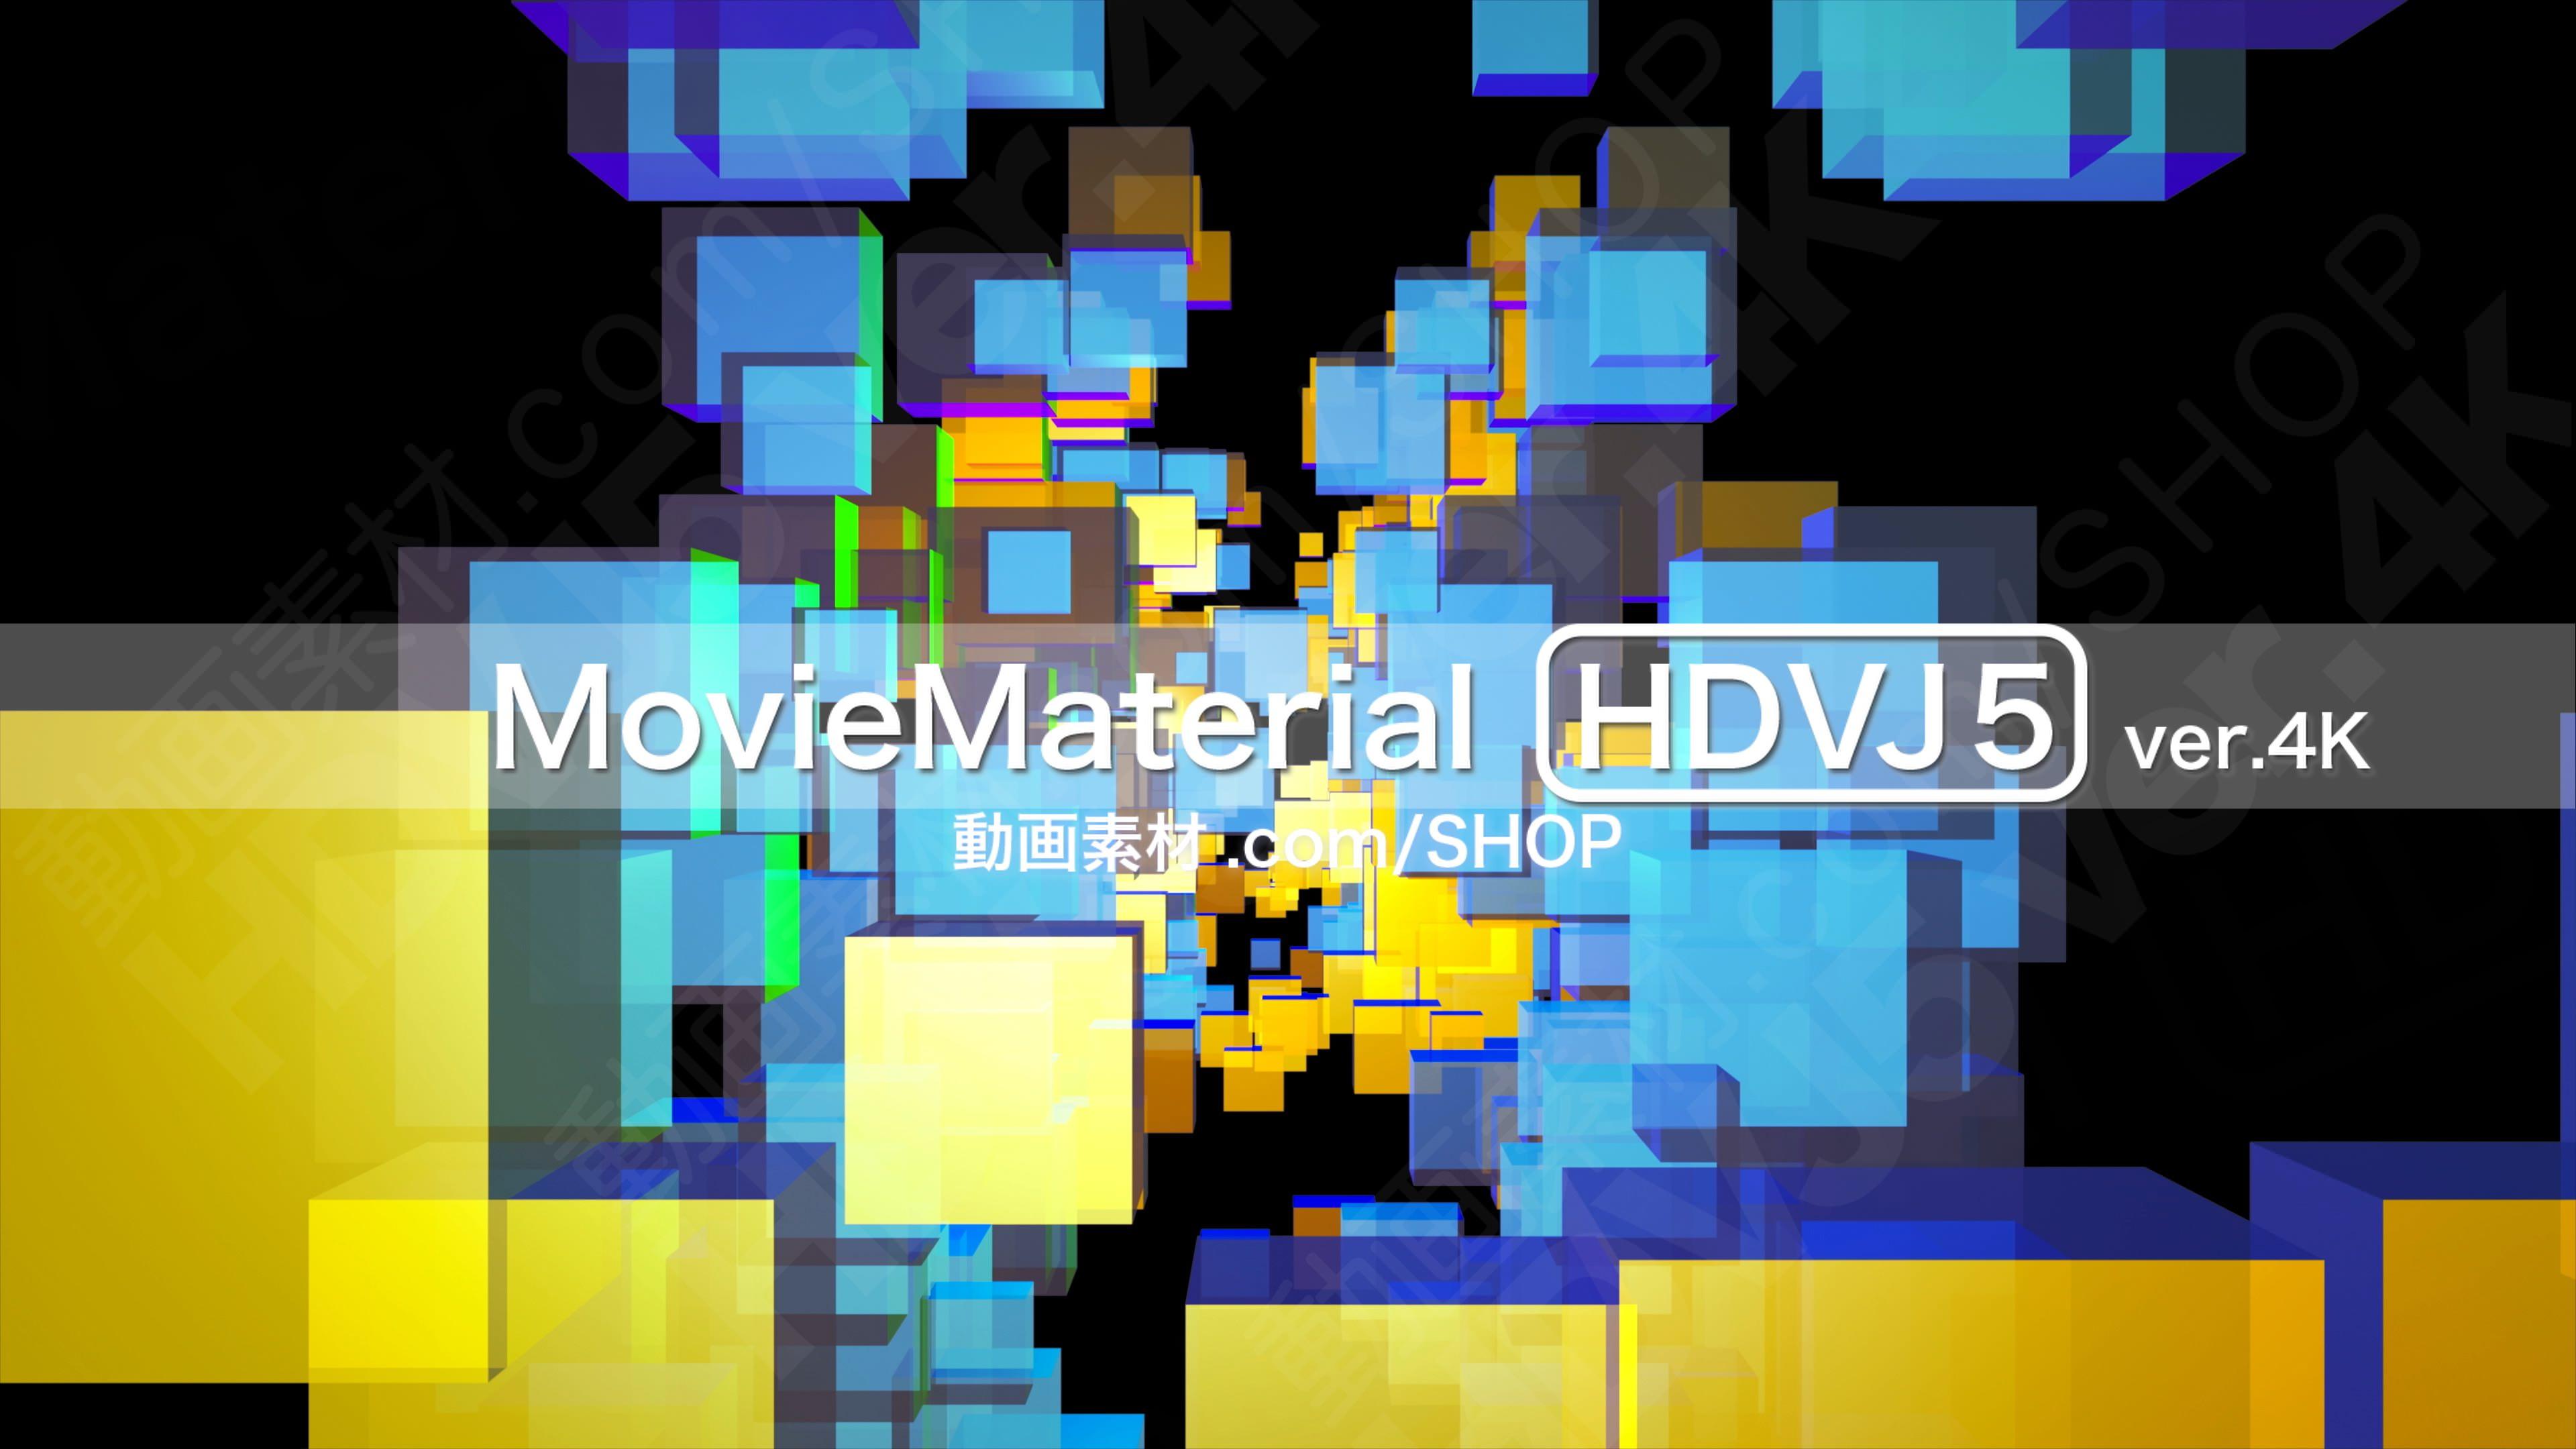 4K2Kループ動画素材集第5段【MovieMaterial HDVJ5 ver.4K】ロイヤリティフリー(著作権使用料無料)4